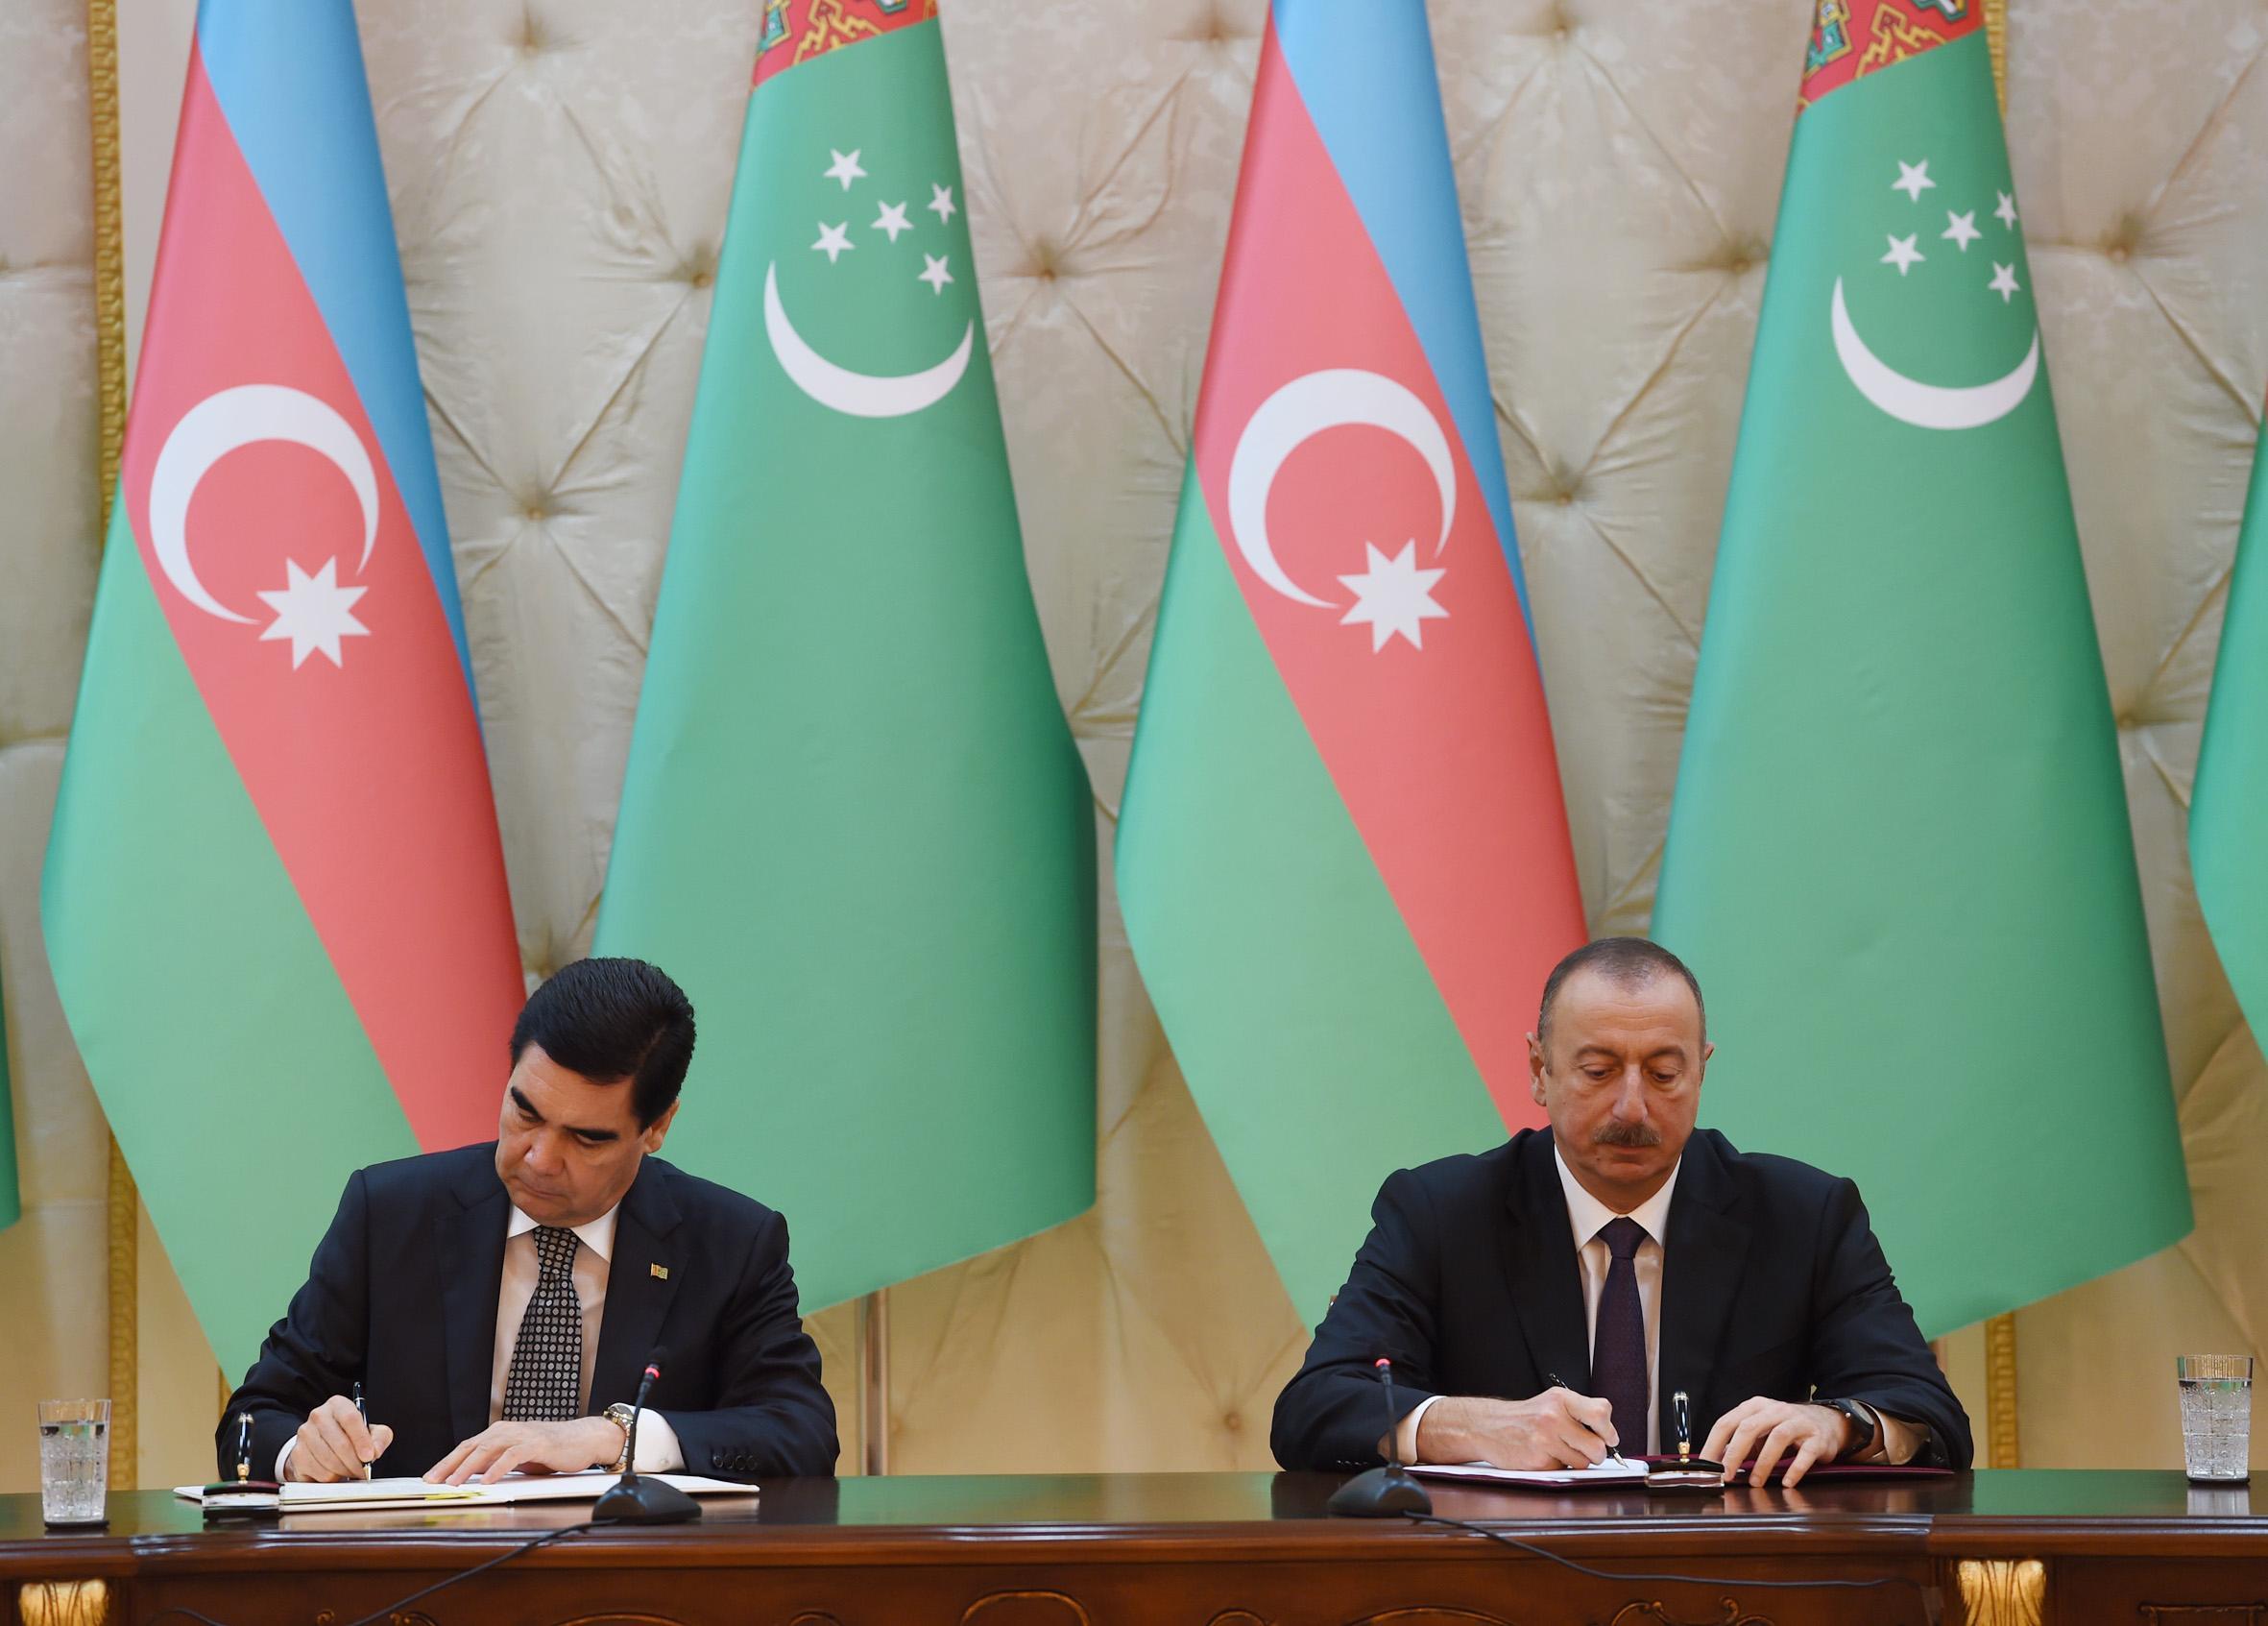 Подписаны азербайджано-туркменские документы - ДОПОЛНЕНО